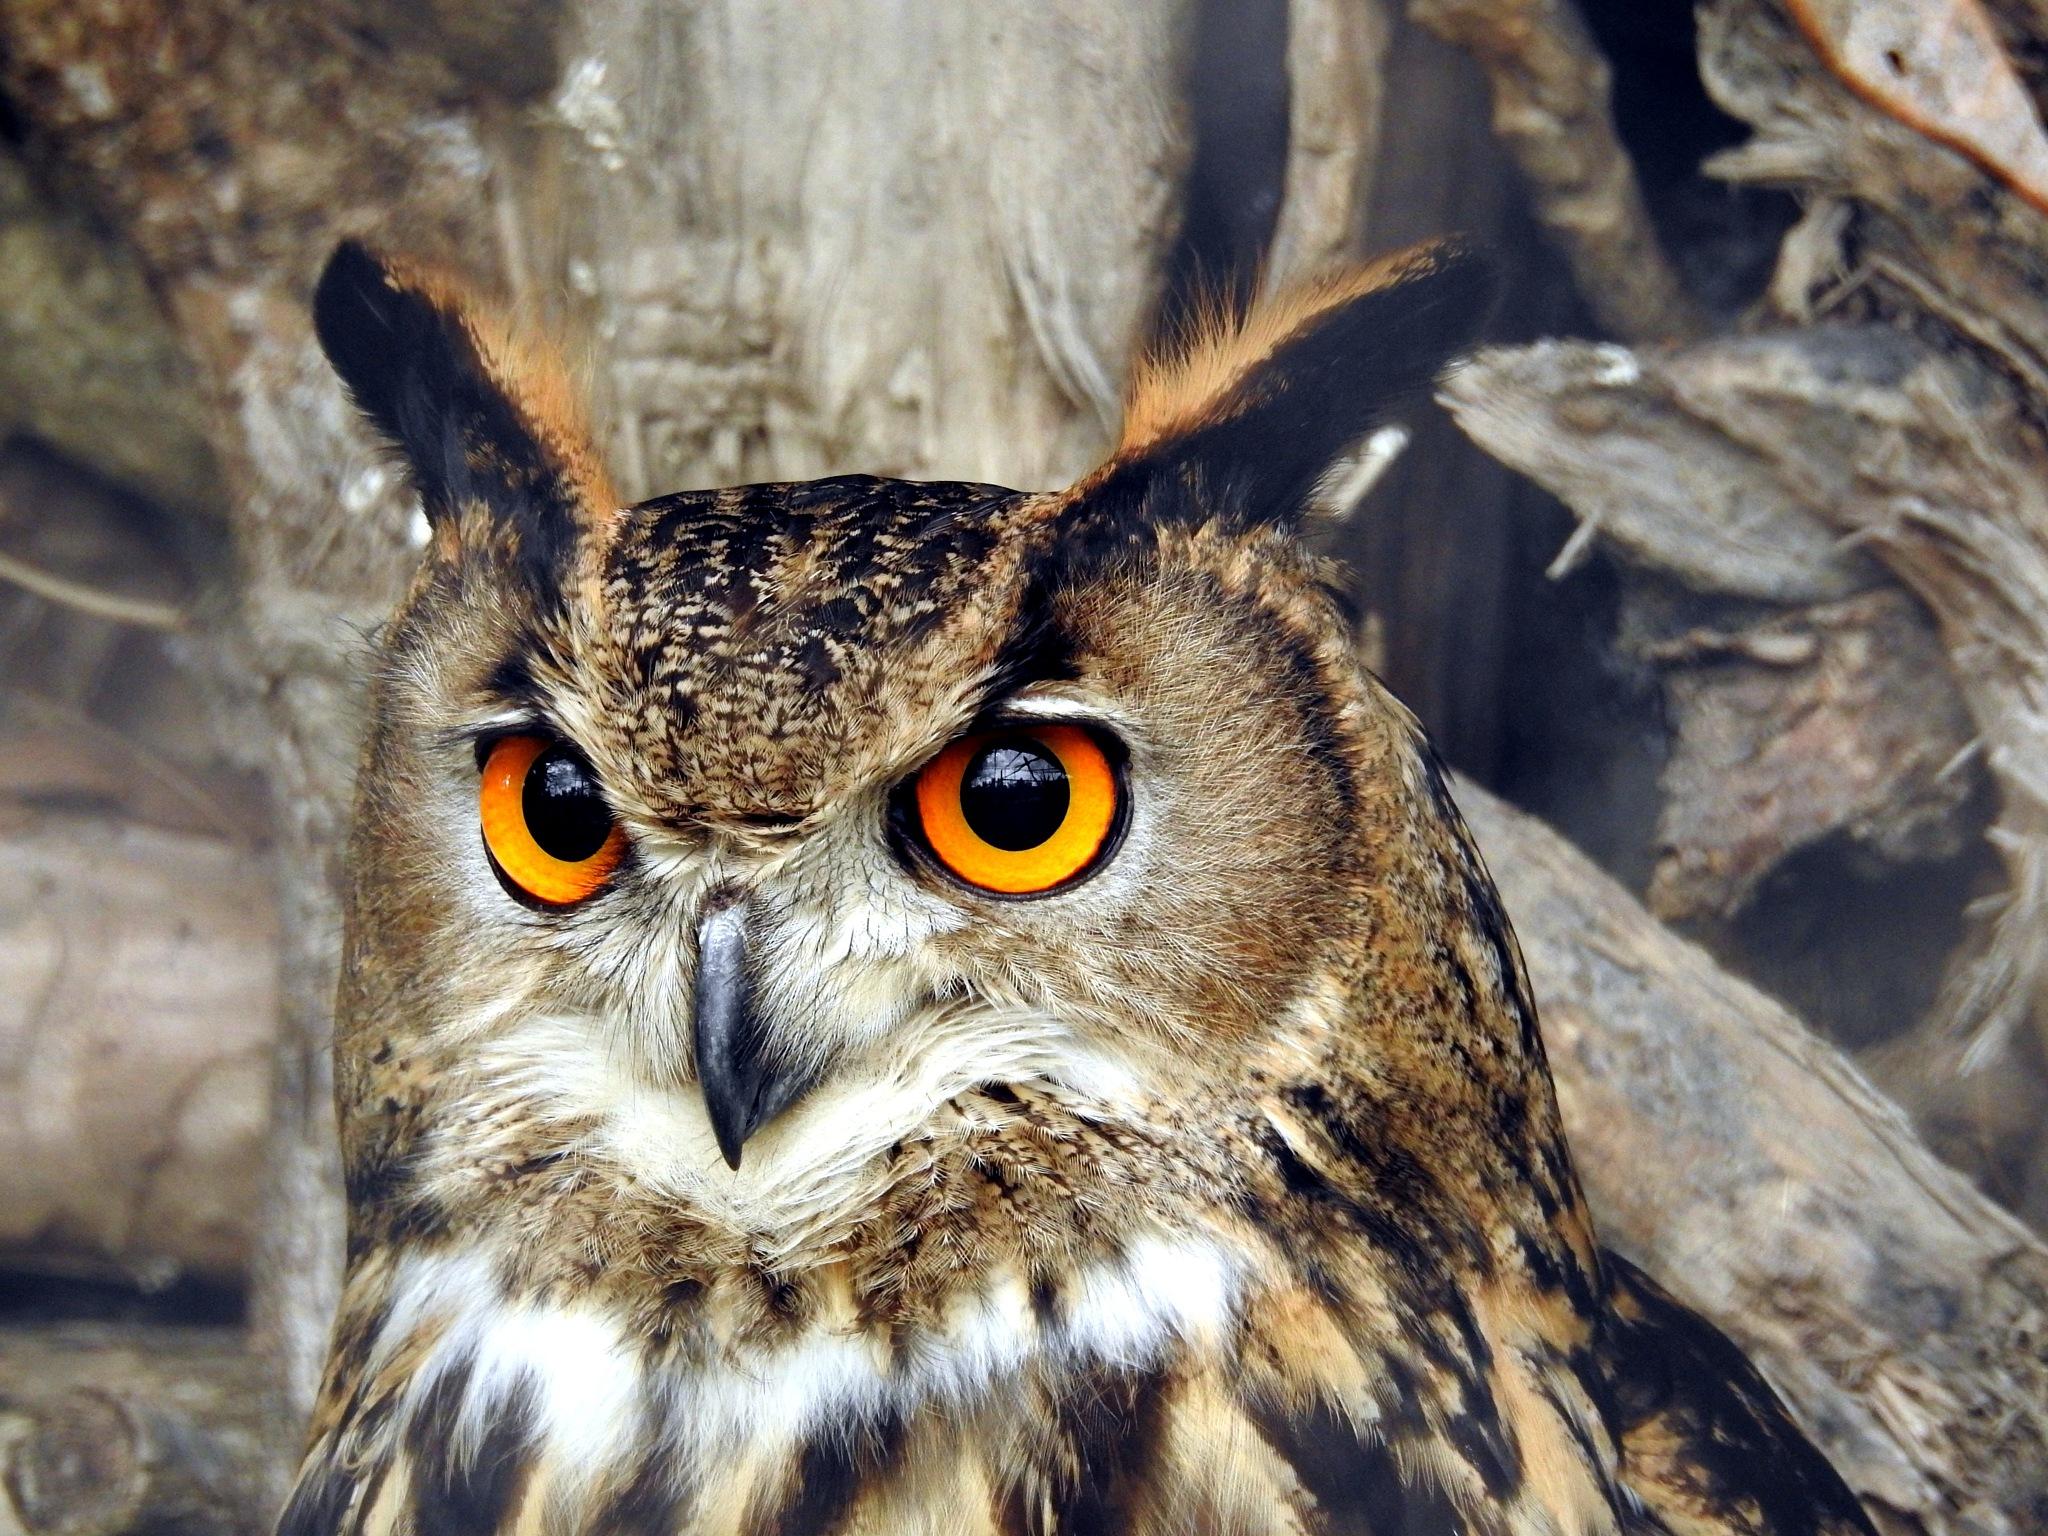 The Eagle Owl's Eyes by Arnaldo De Lisio